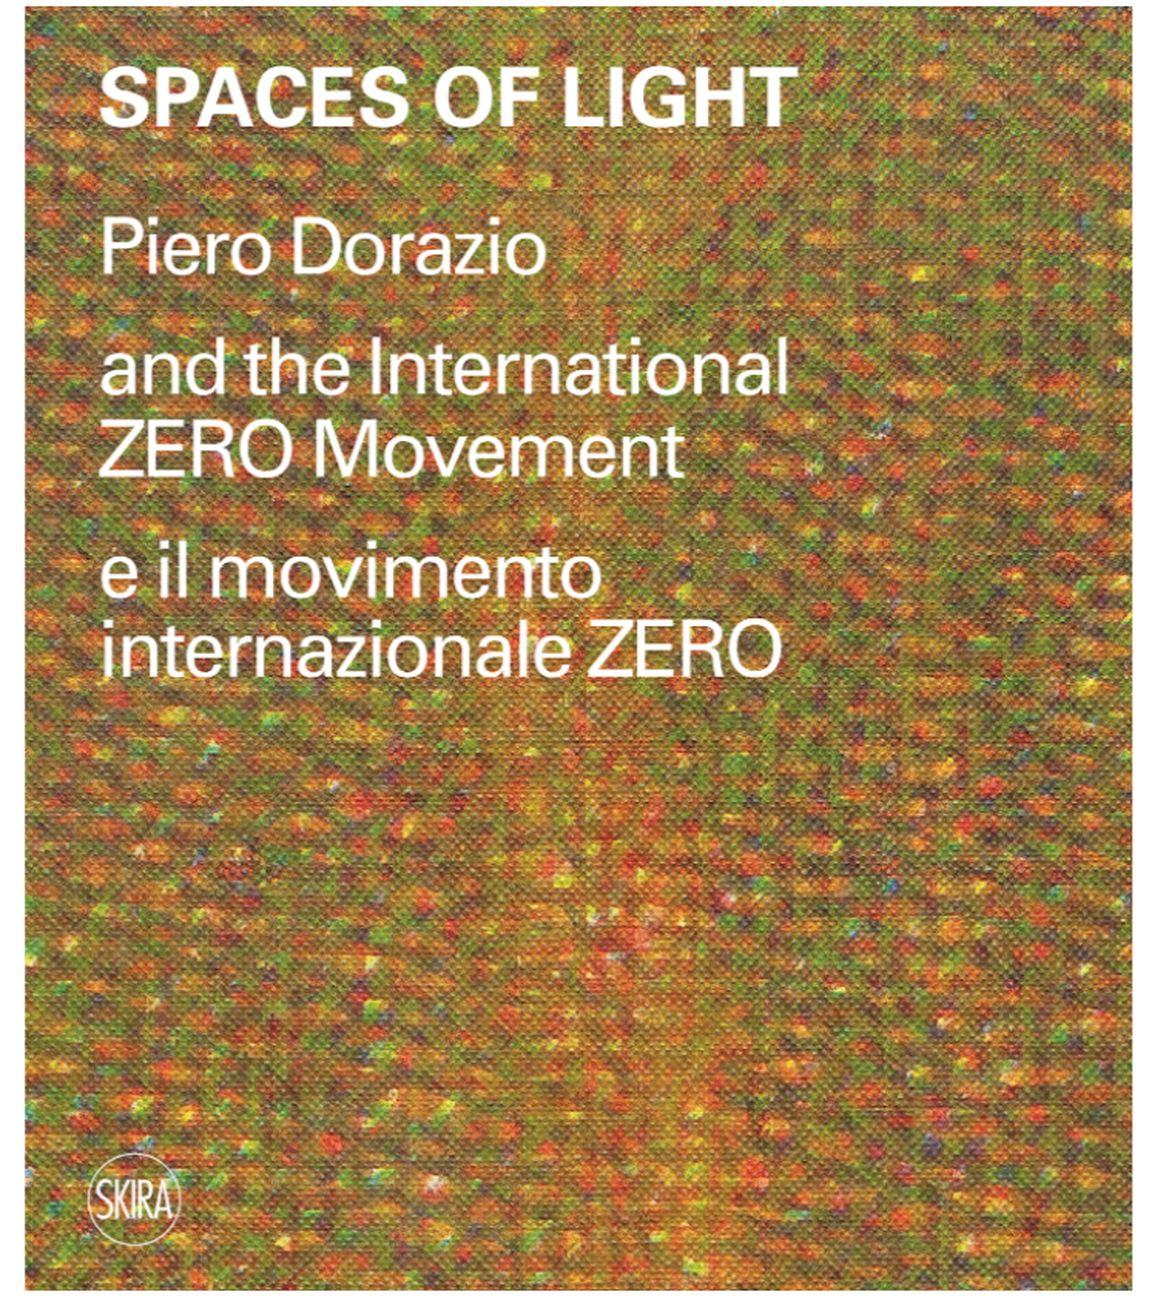 Francesca Pola - Spaces of Light. Piero Dorazio and the International ZERO Movement (Skira, Milano 2021)